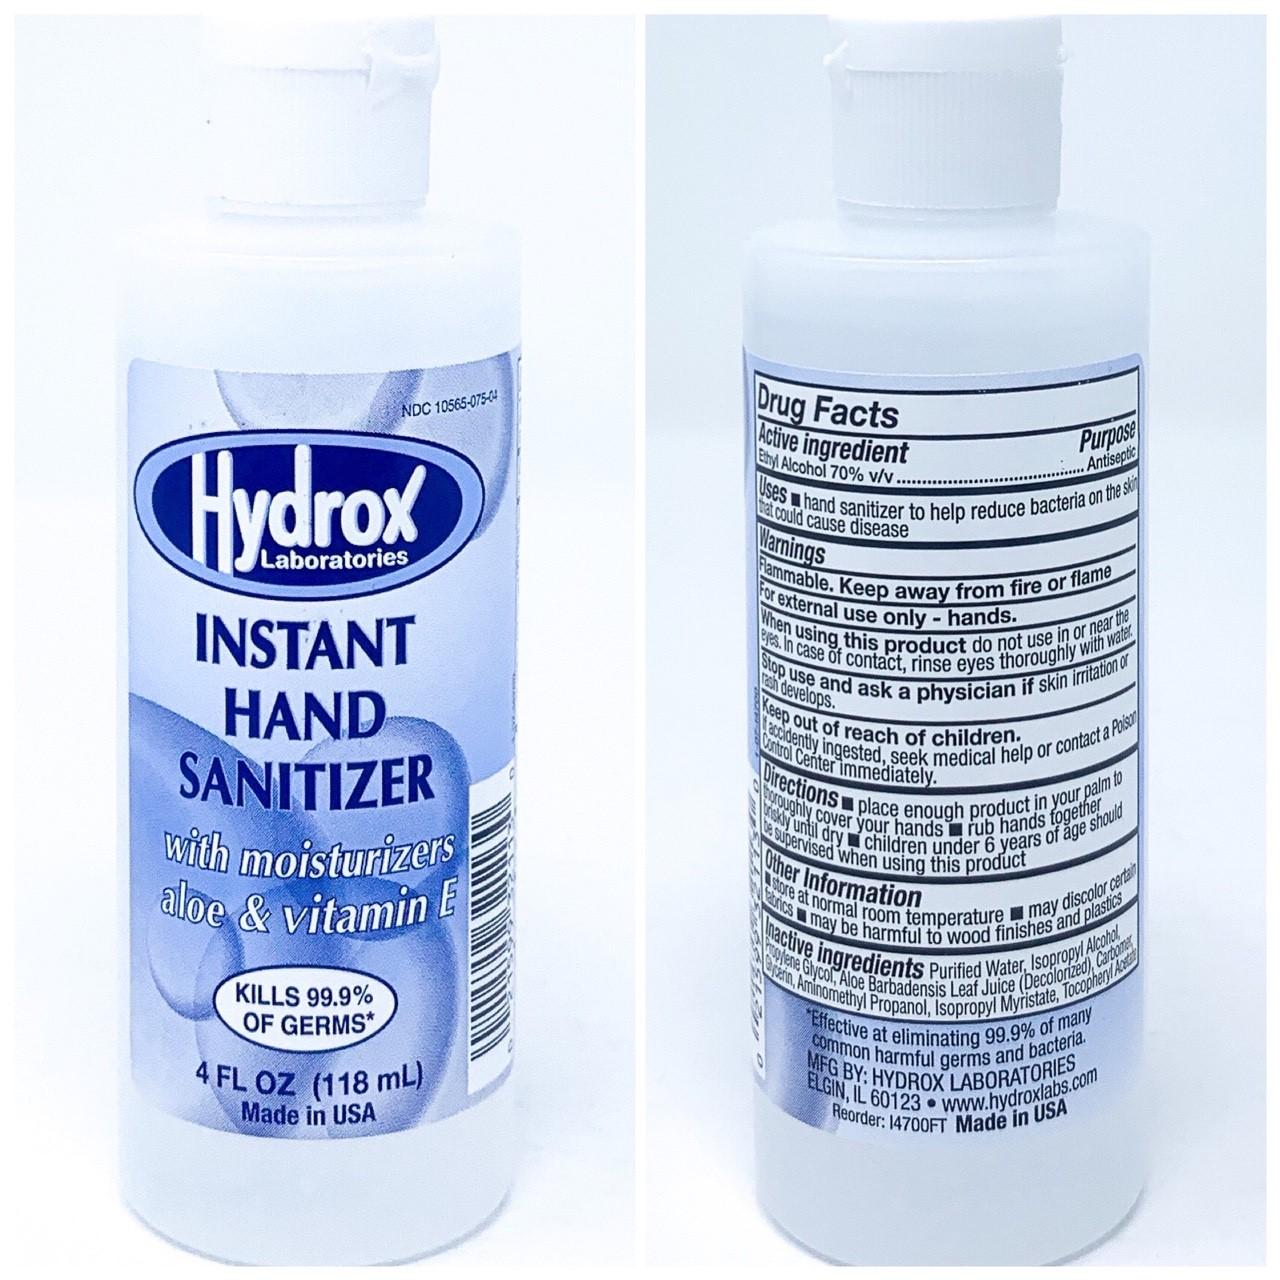 HAND SANITIZER-HYDROX Hand Sanitizer, Gel, 4 oz, 70% Ethyl Alcohol, Unscented